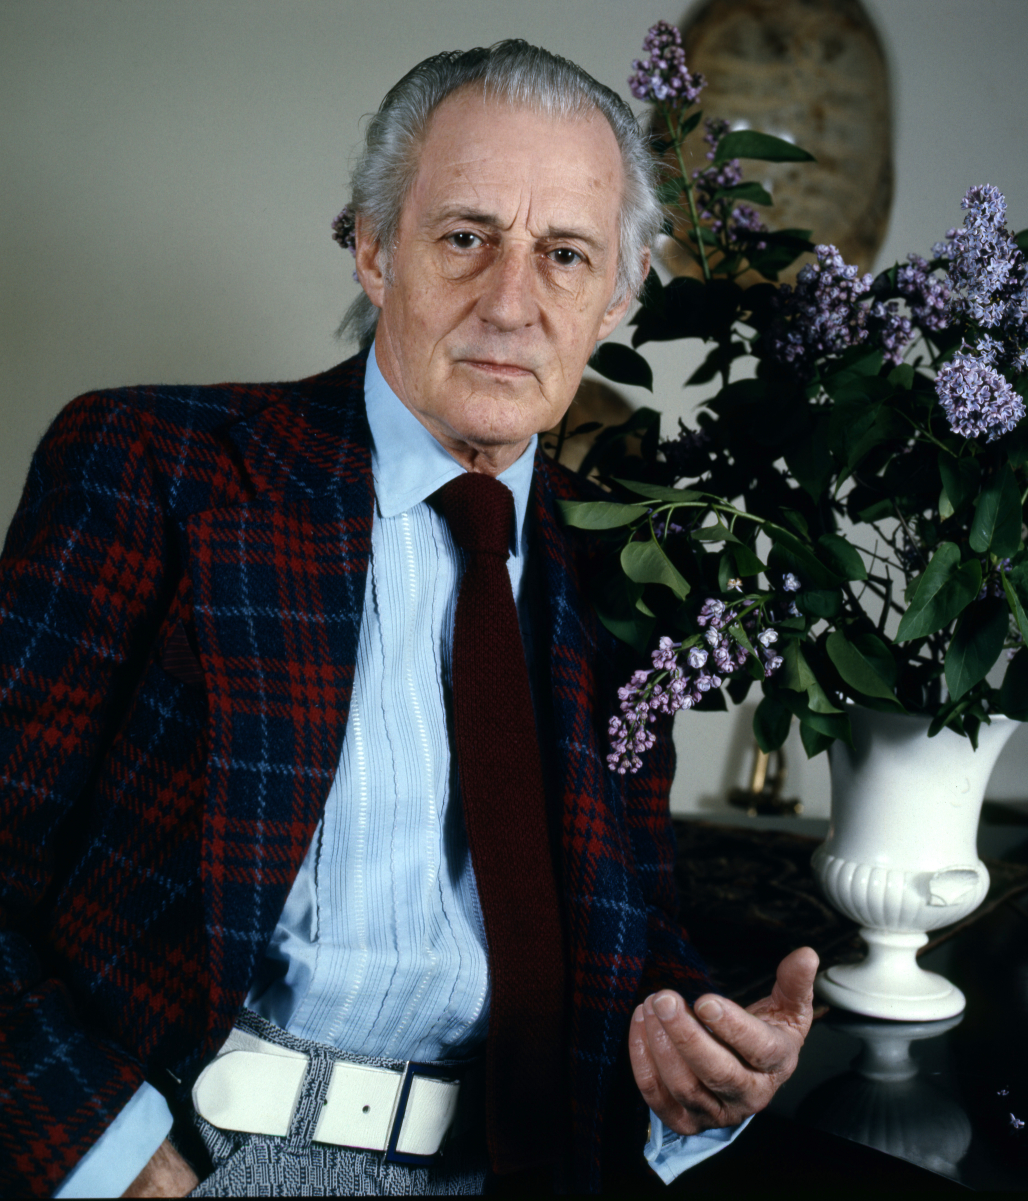 "Portrait of Sir Anton Dolin by <a href=""/content/Allan_Warren"" style=""color:blue"">Allan Warren</a>"